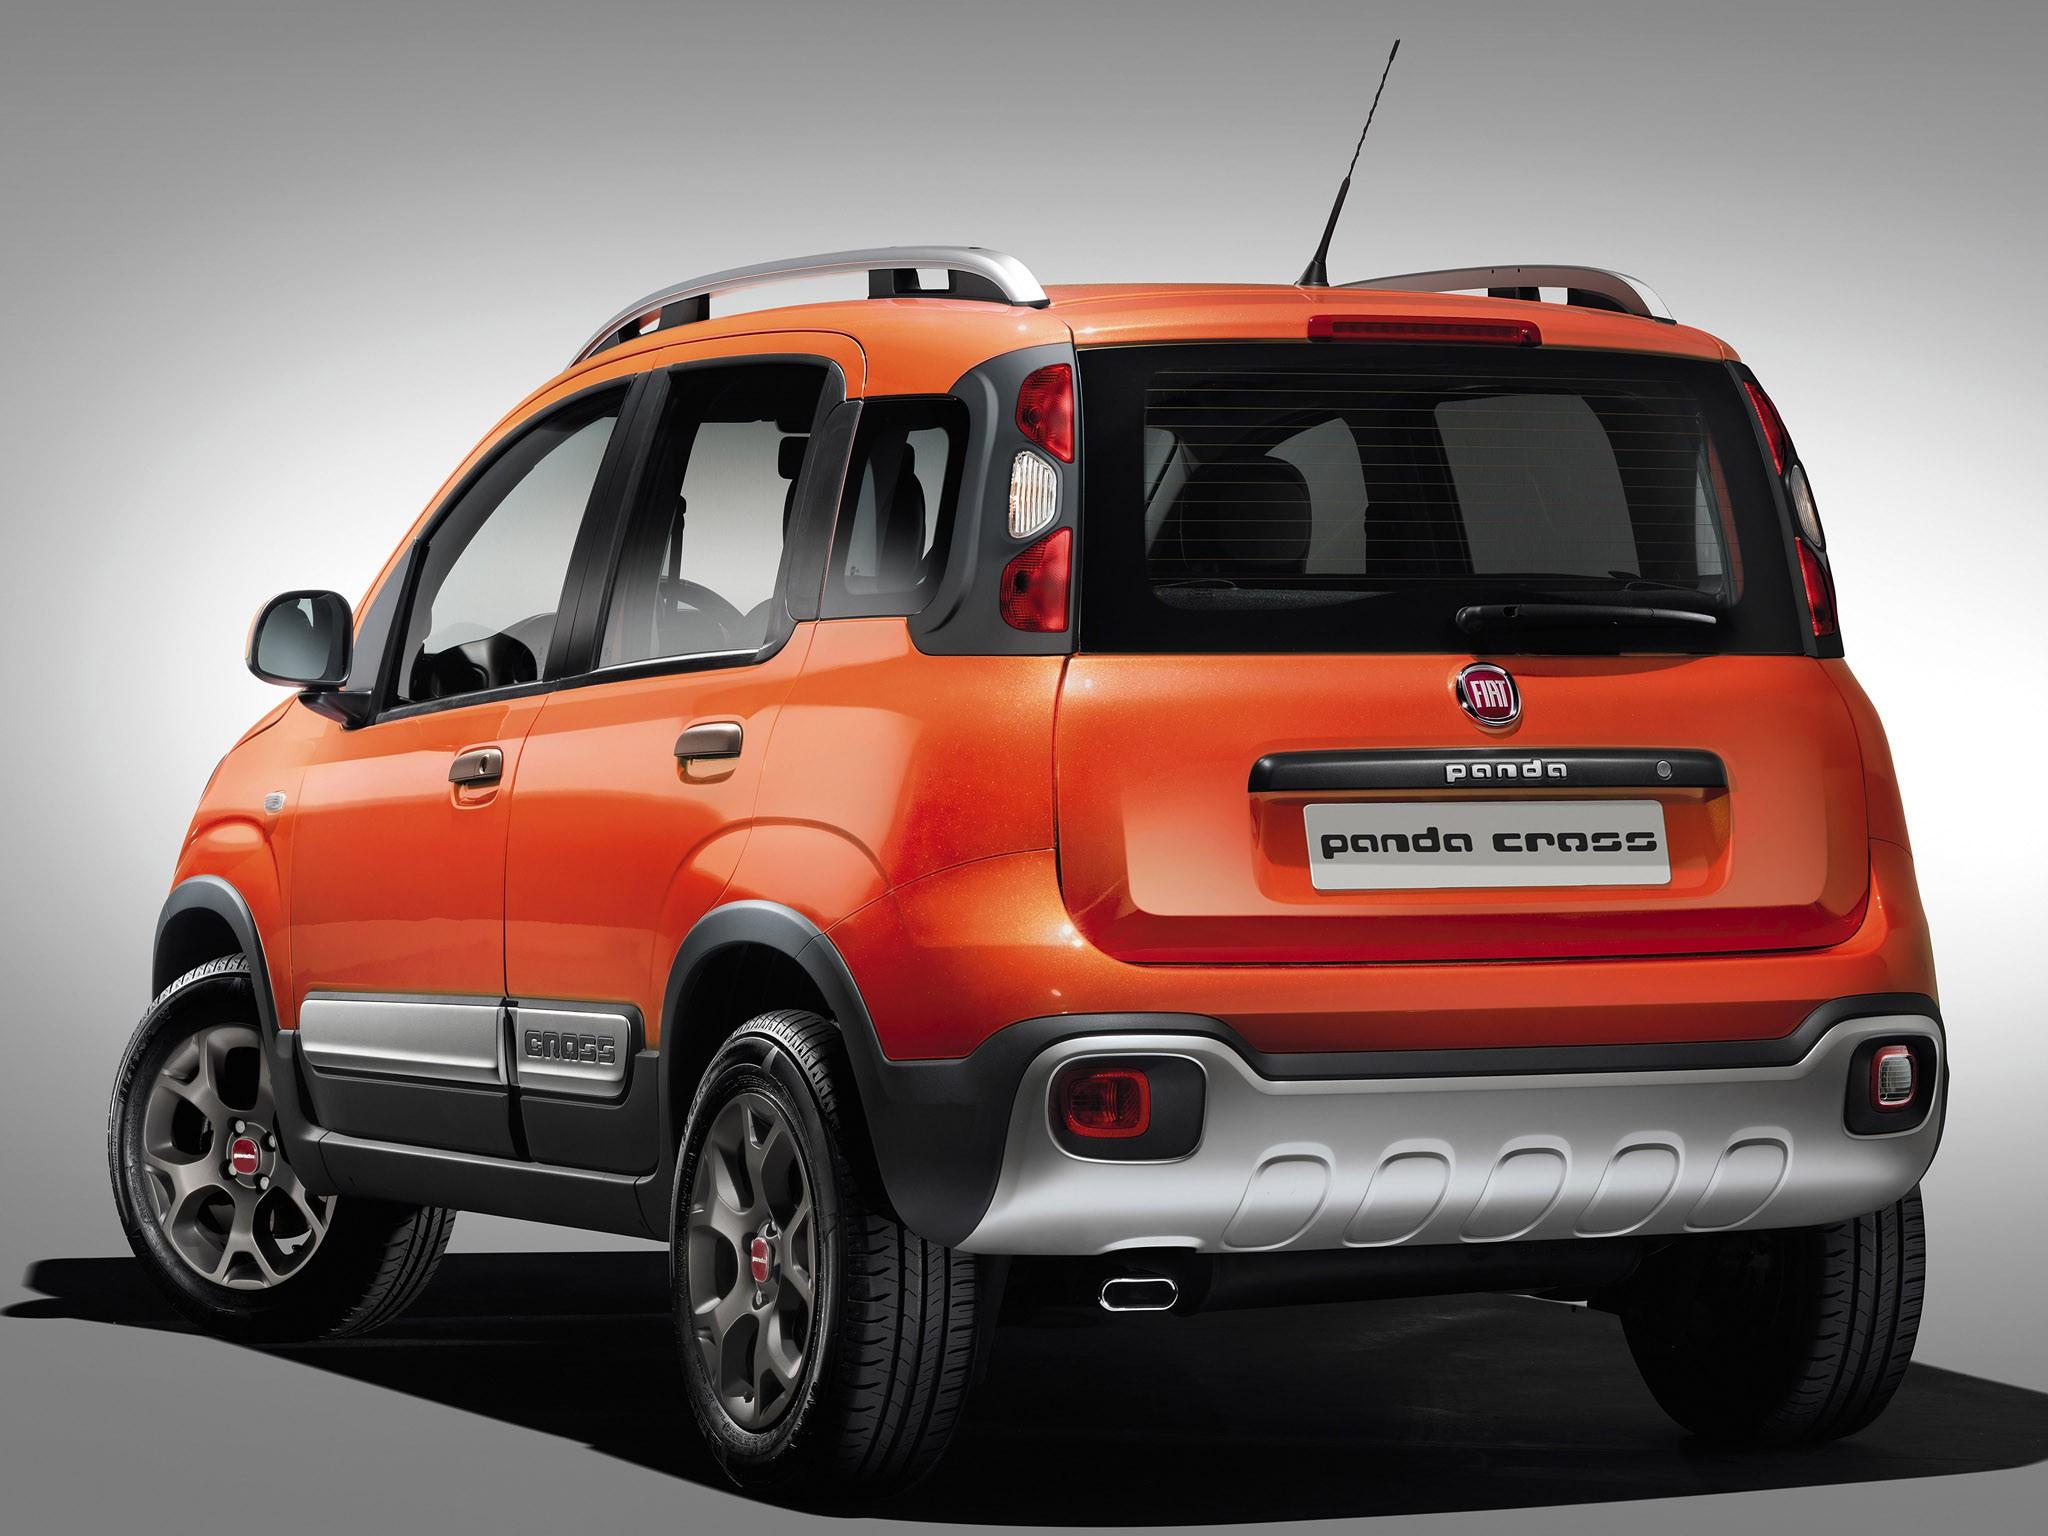 Fiat Panda Cross 2014 - Photoscar